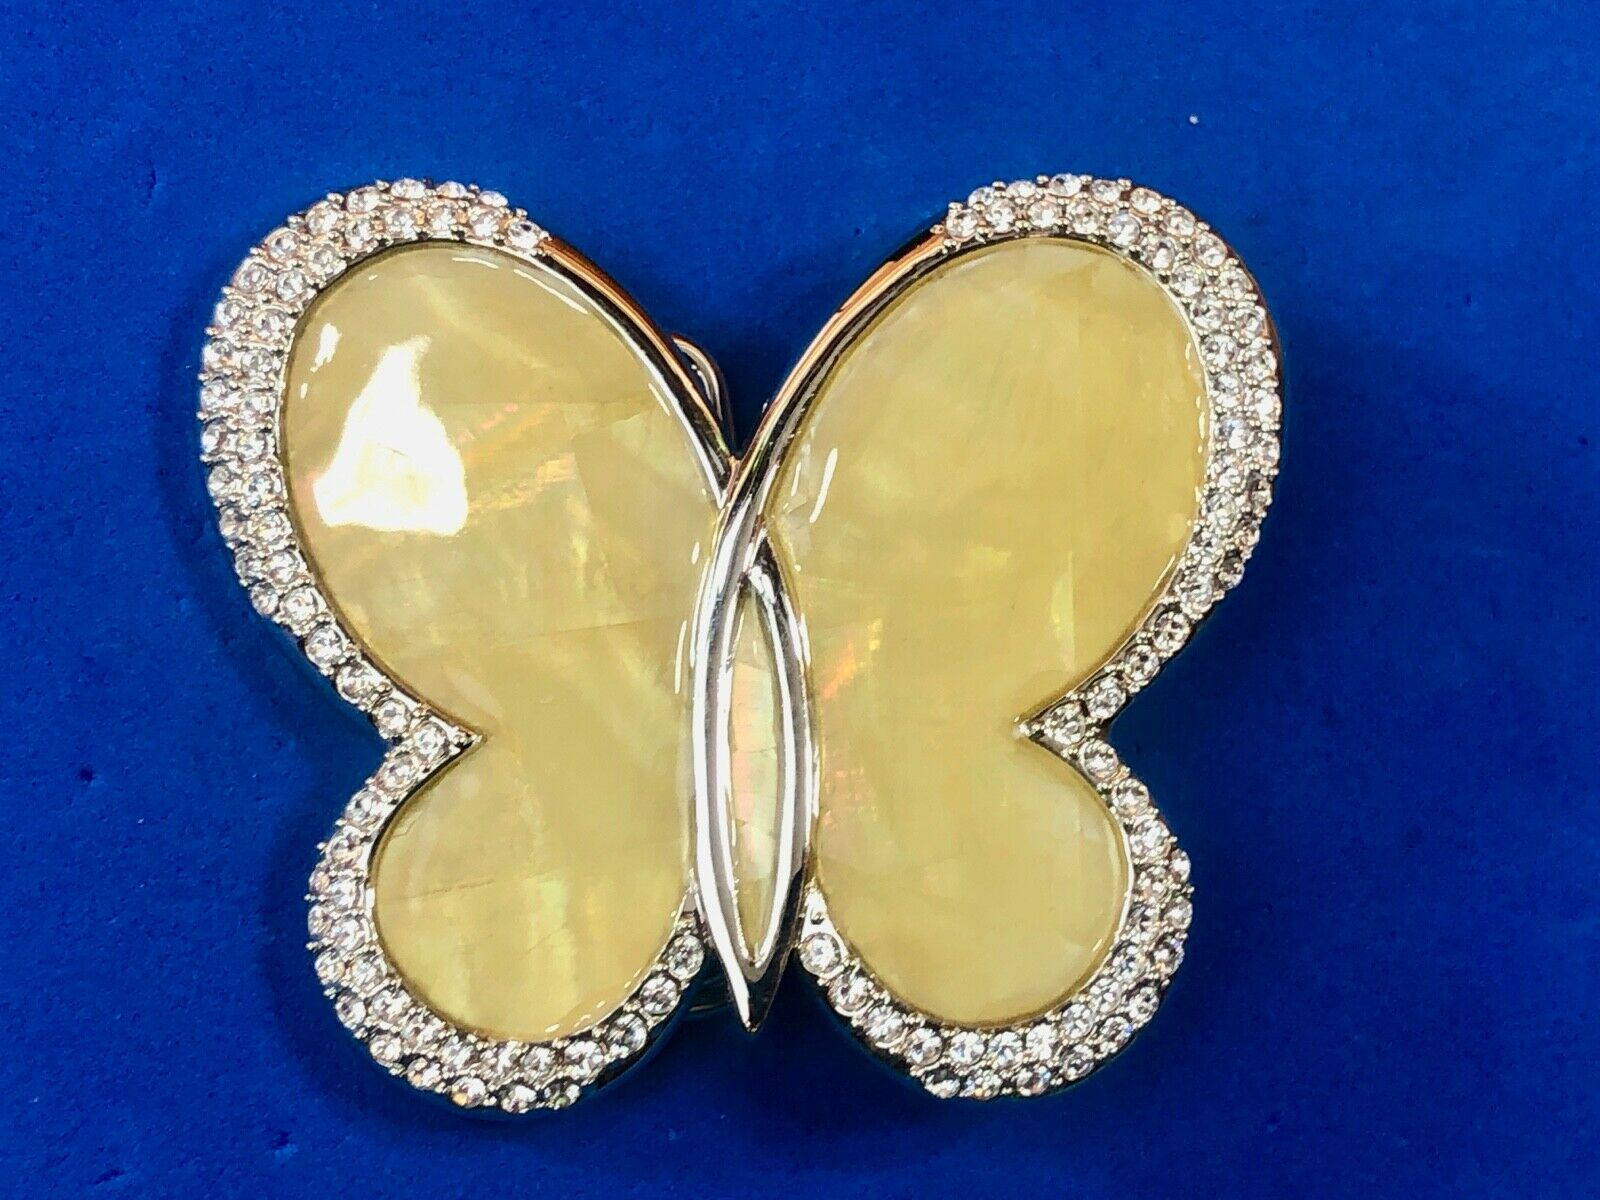 Adorable small yellow figural Women's butterfly Belt Buckle w/ rhinestones